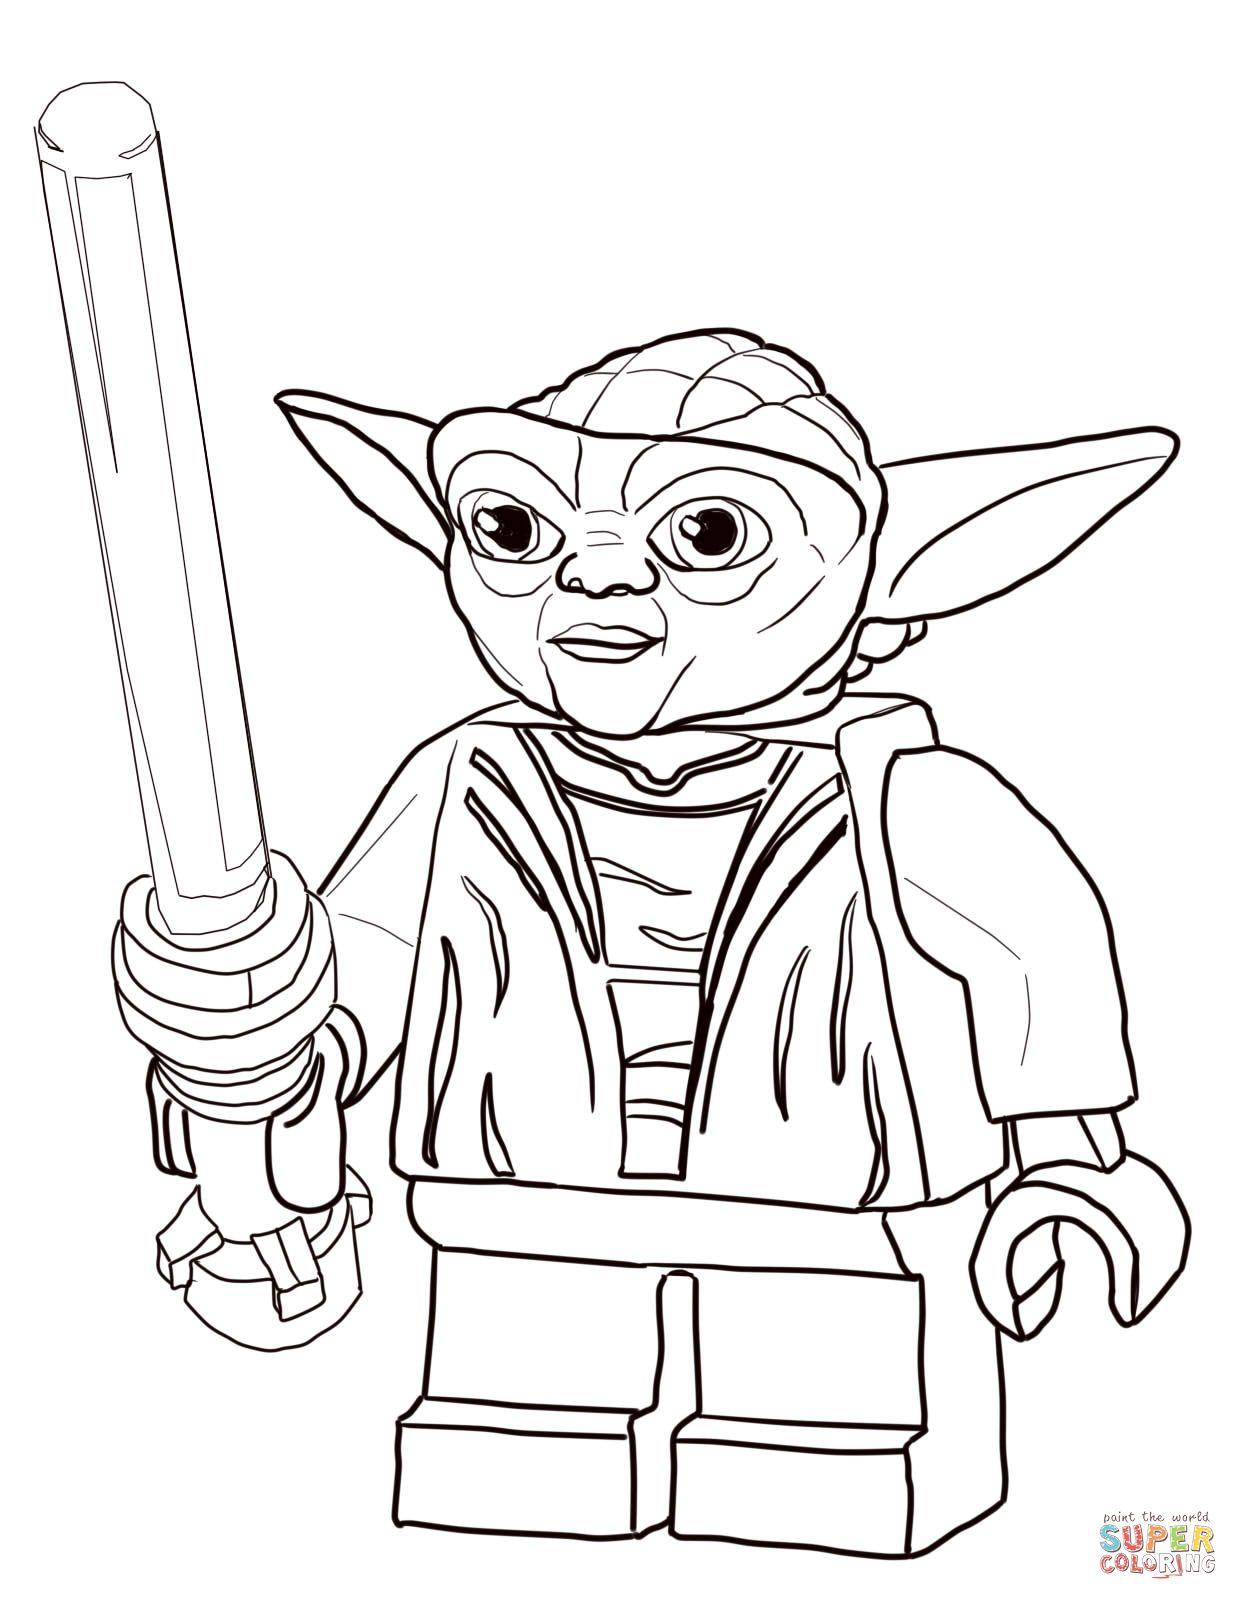 Lego Star Wars Master Yoda Coloring Page